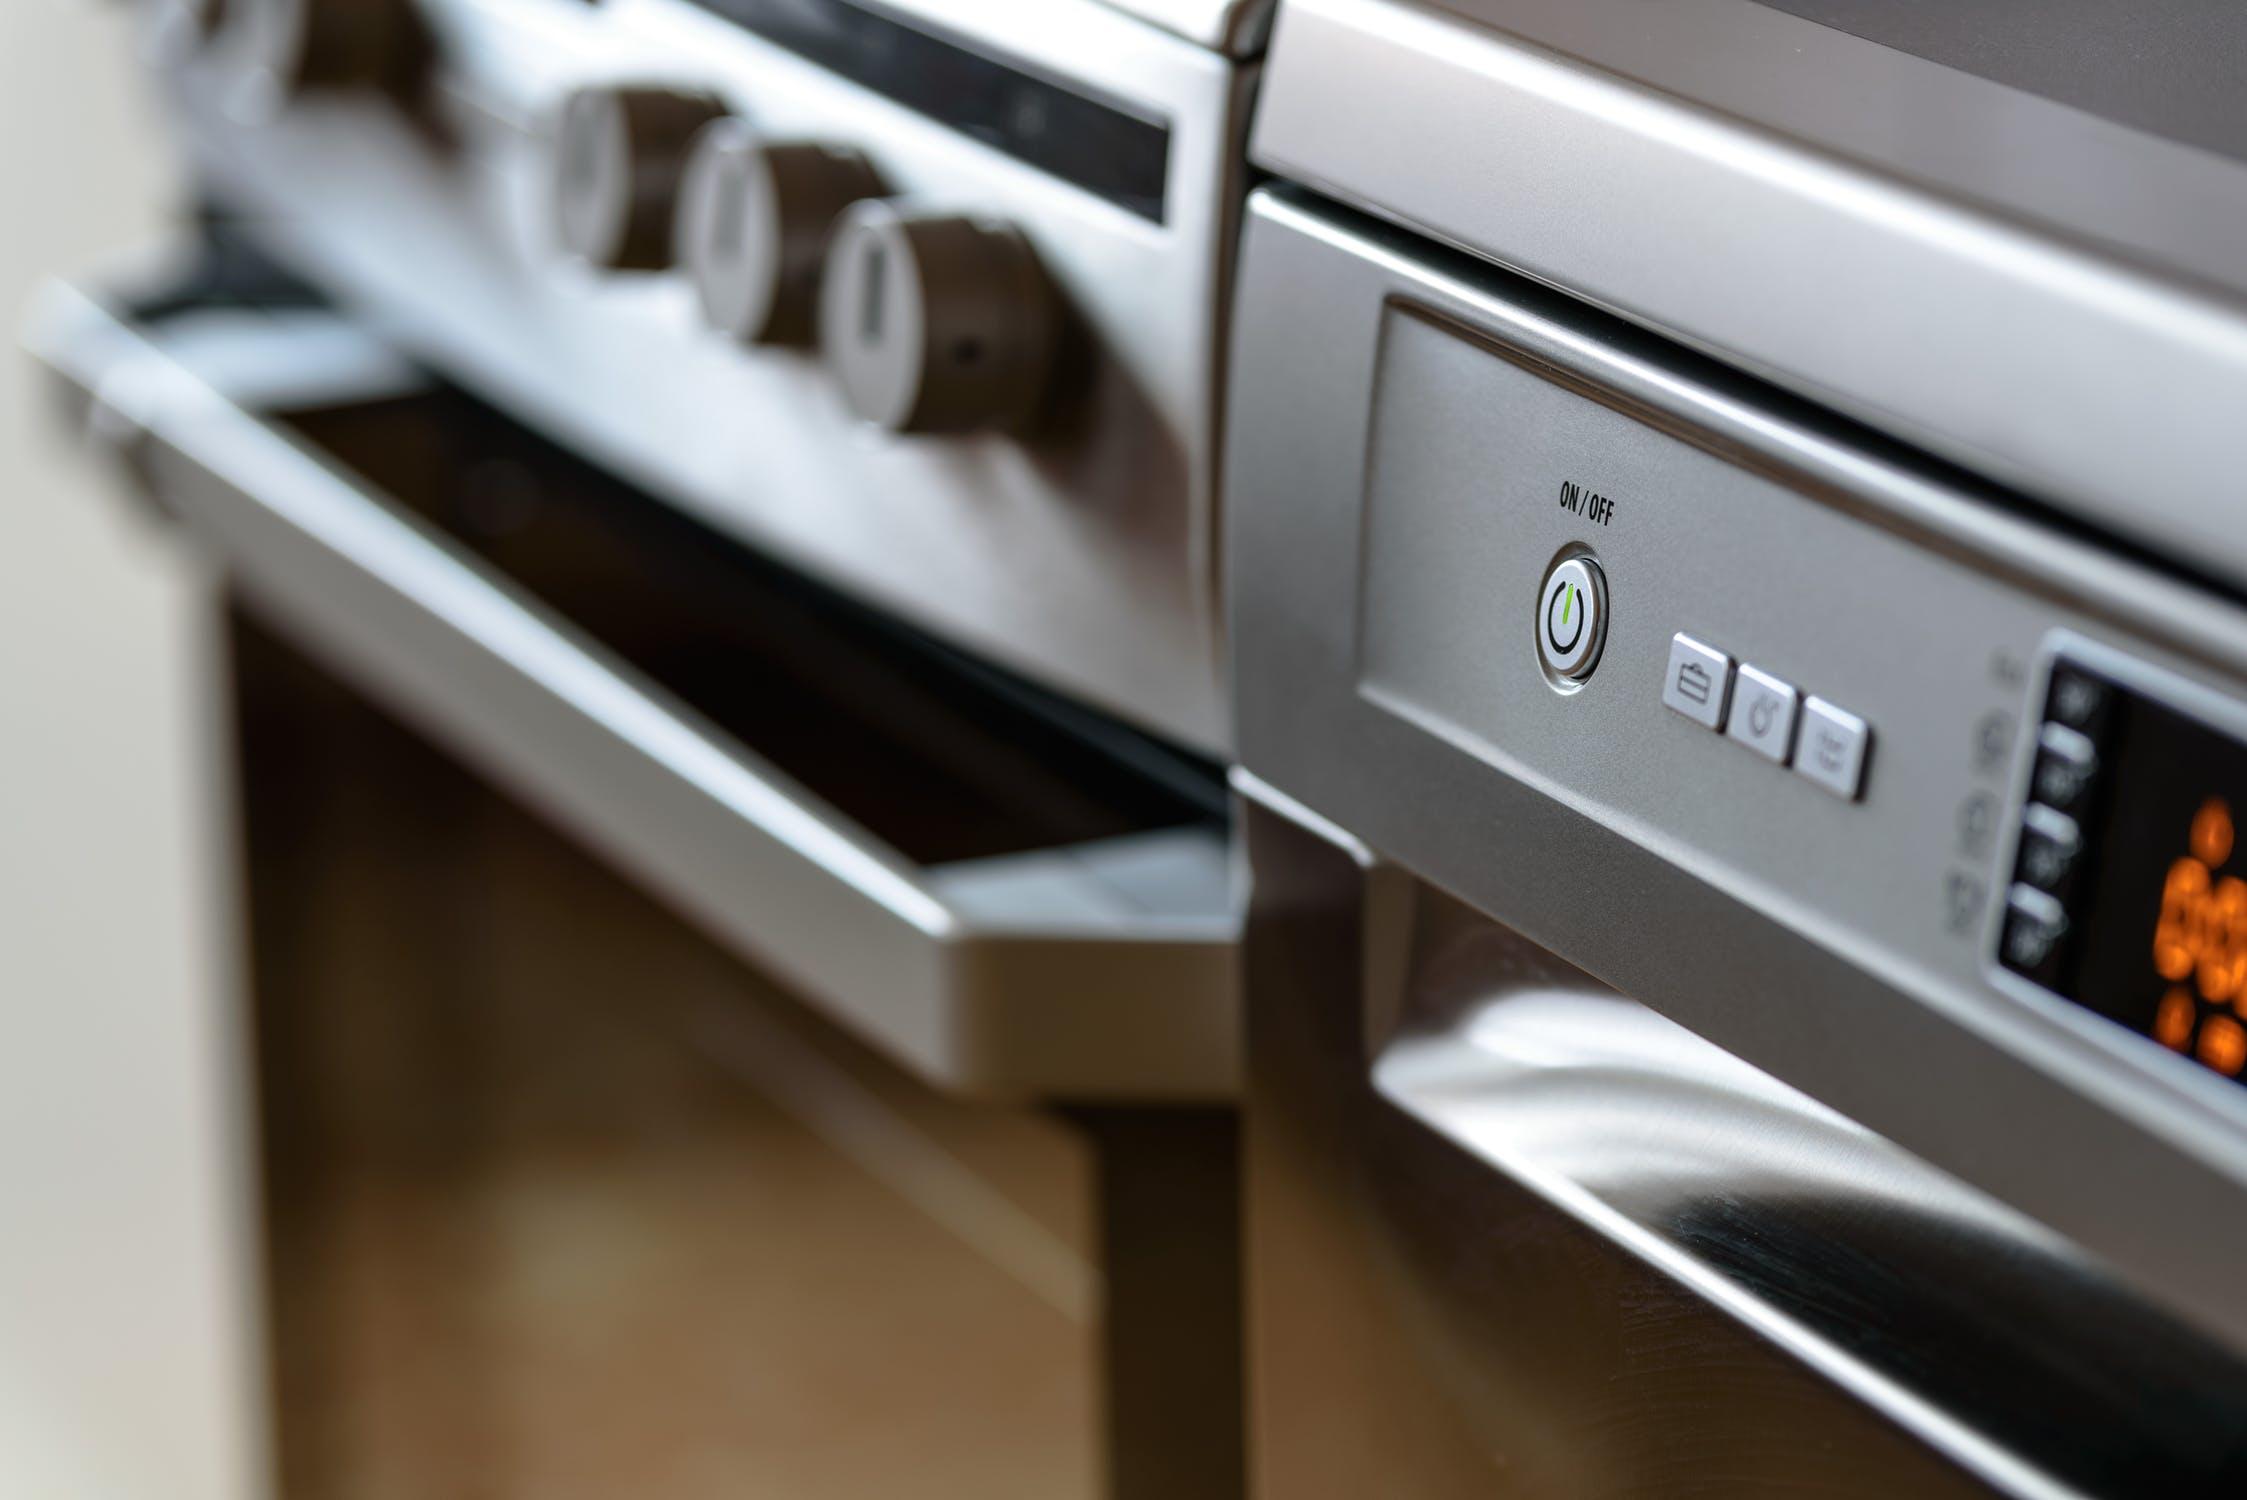 11 Best Dishwashers on The Market (Buying Guide)